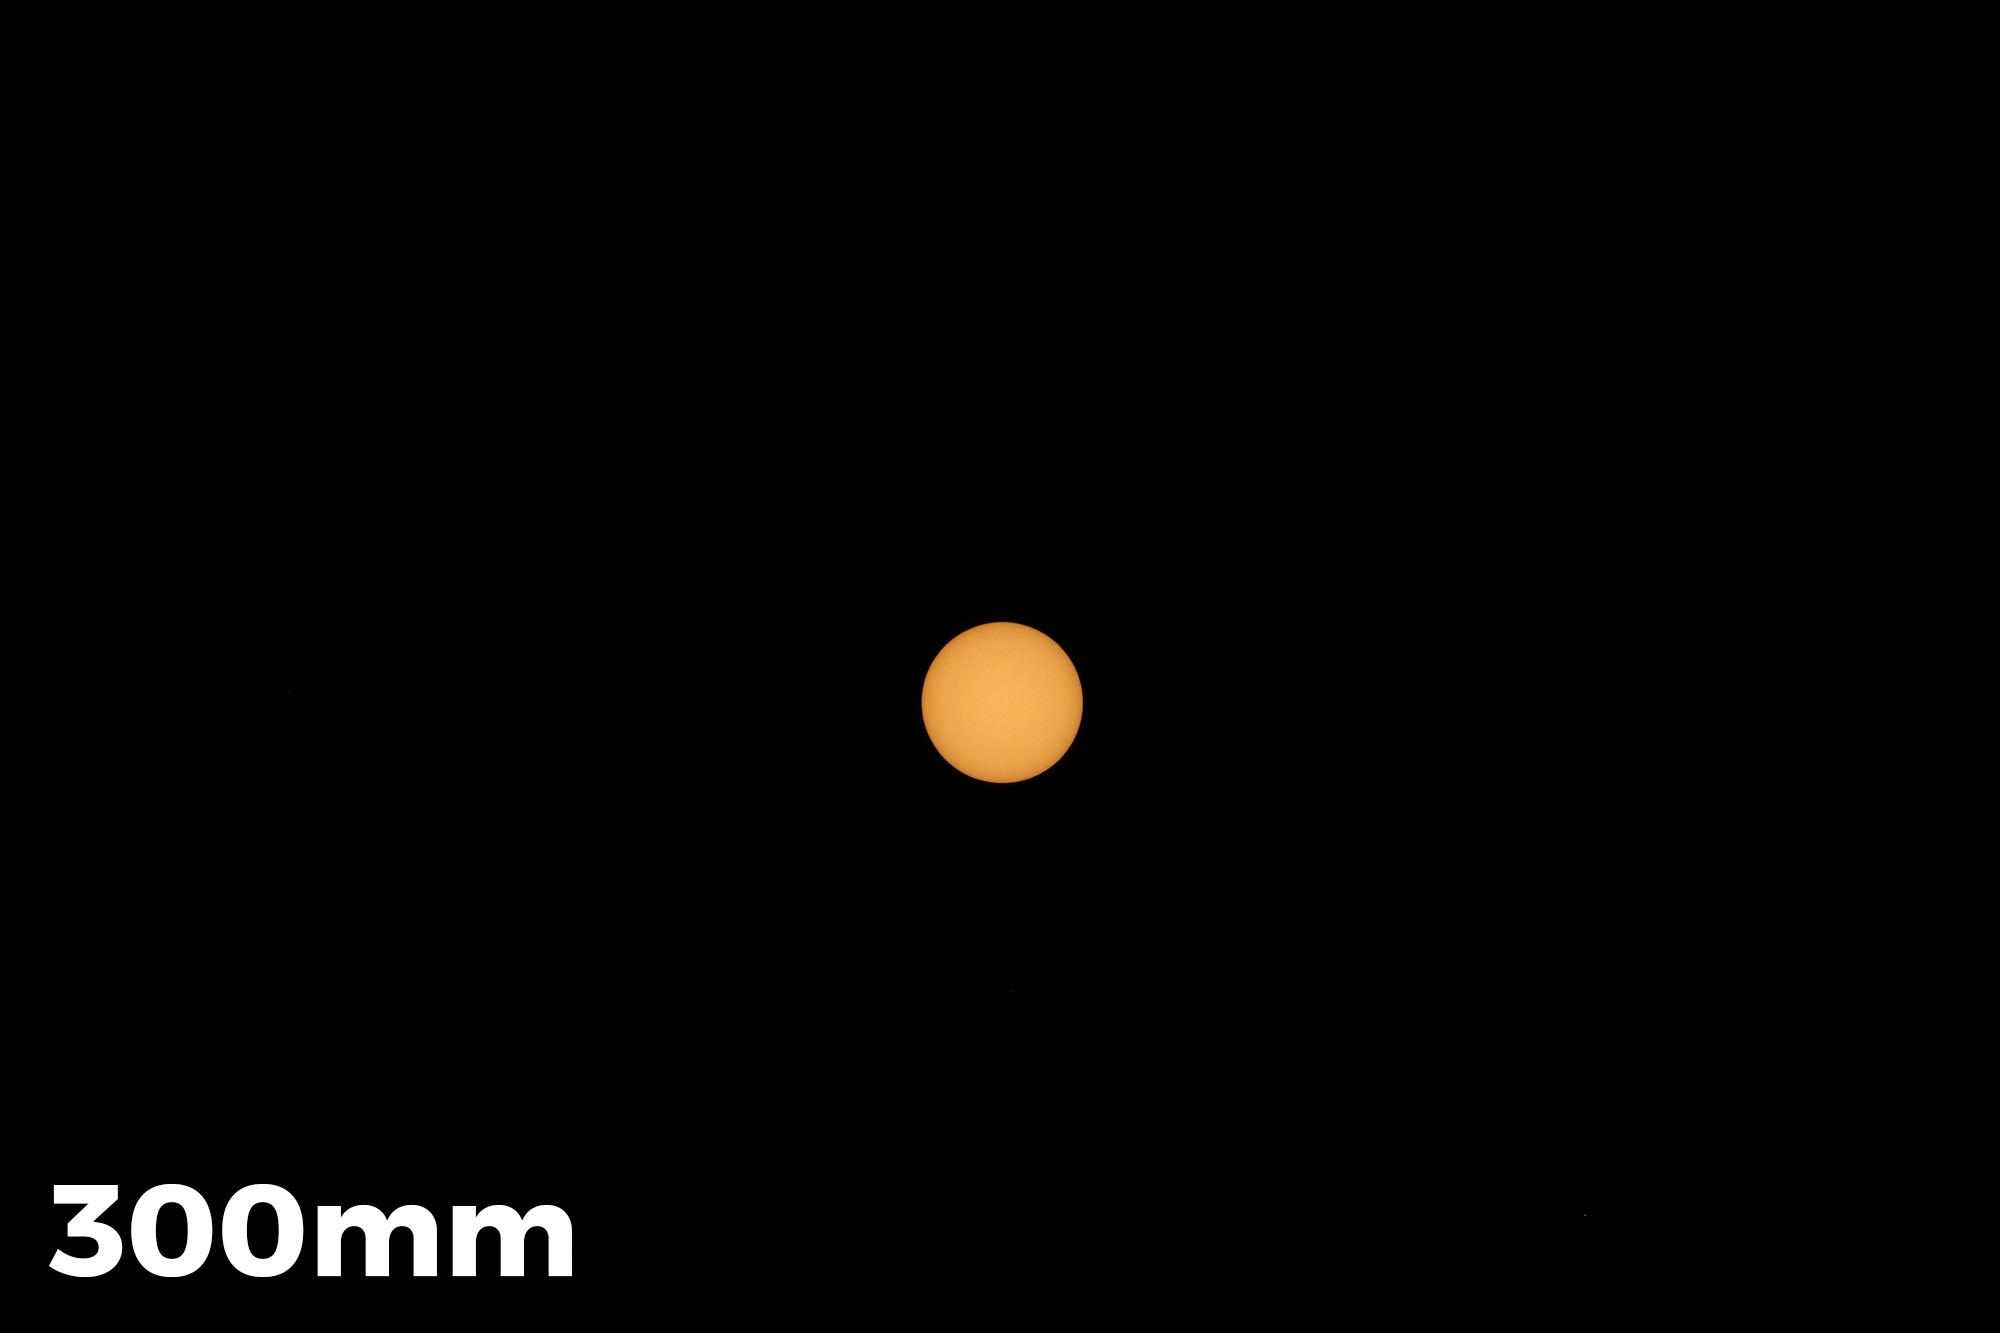 Sun_300mm.jpg